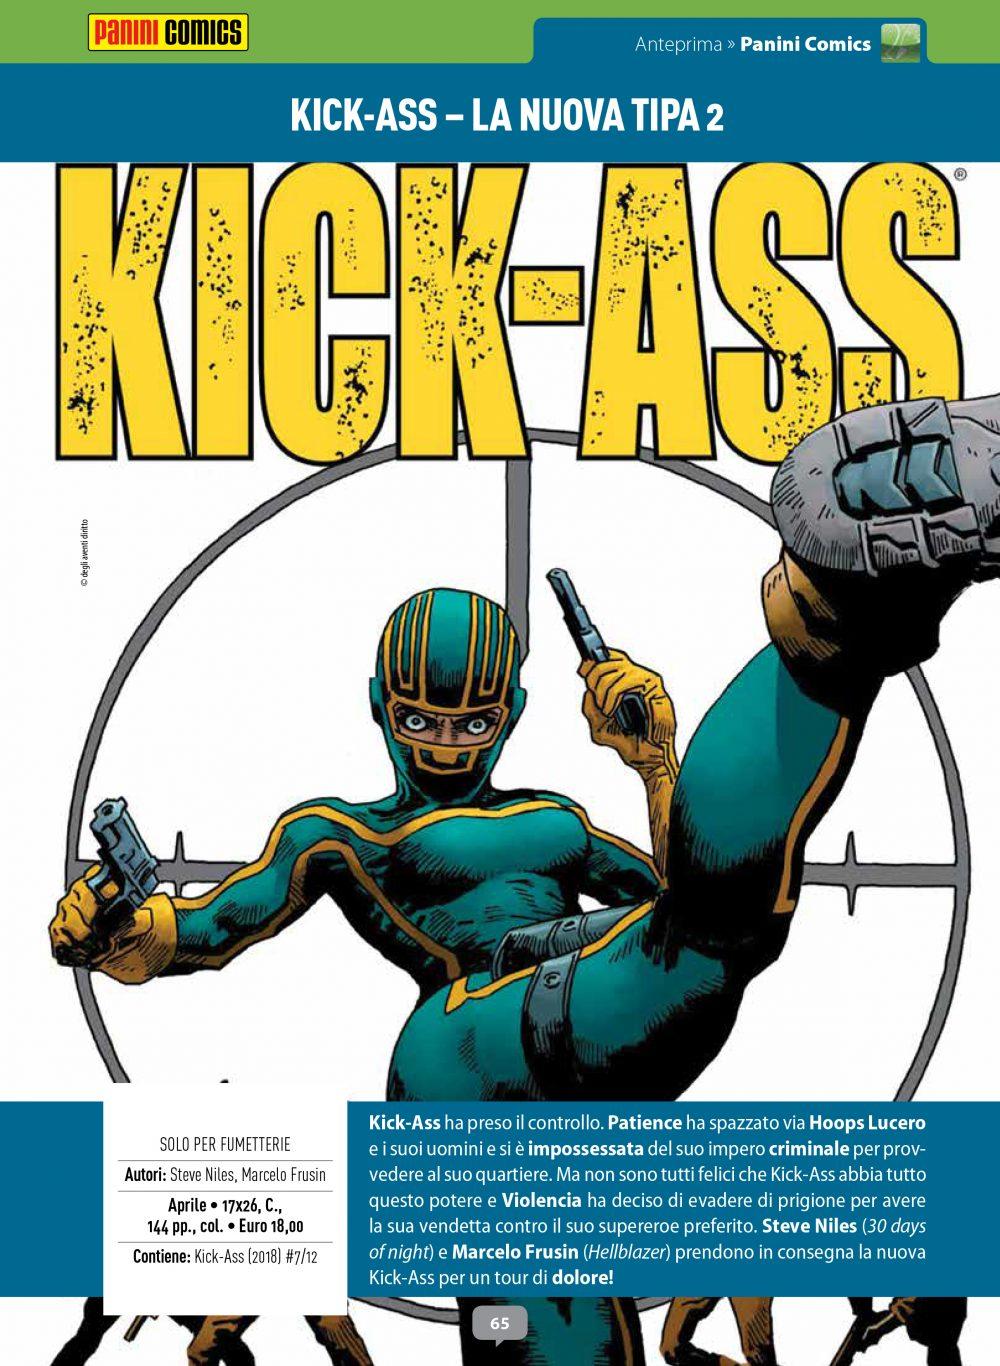 Kick-Ass su Anteprima